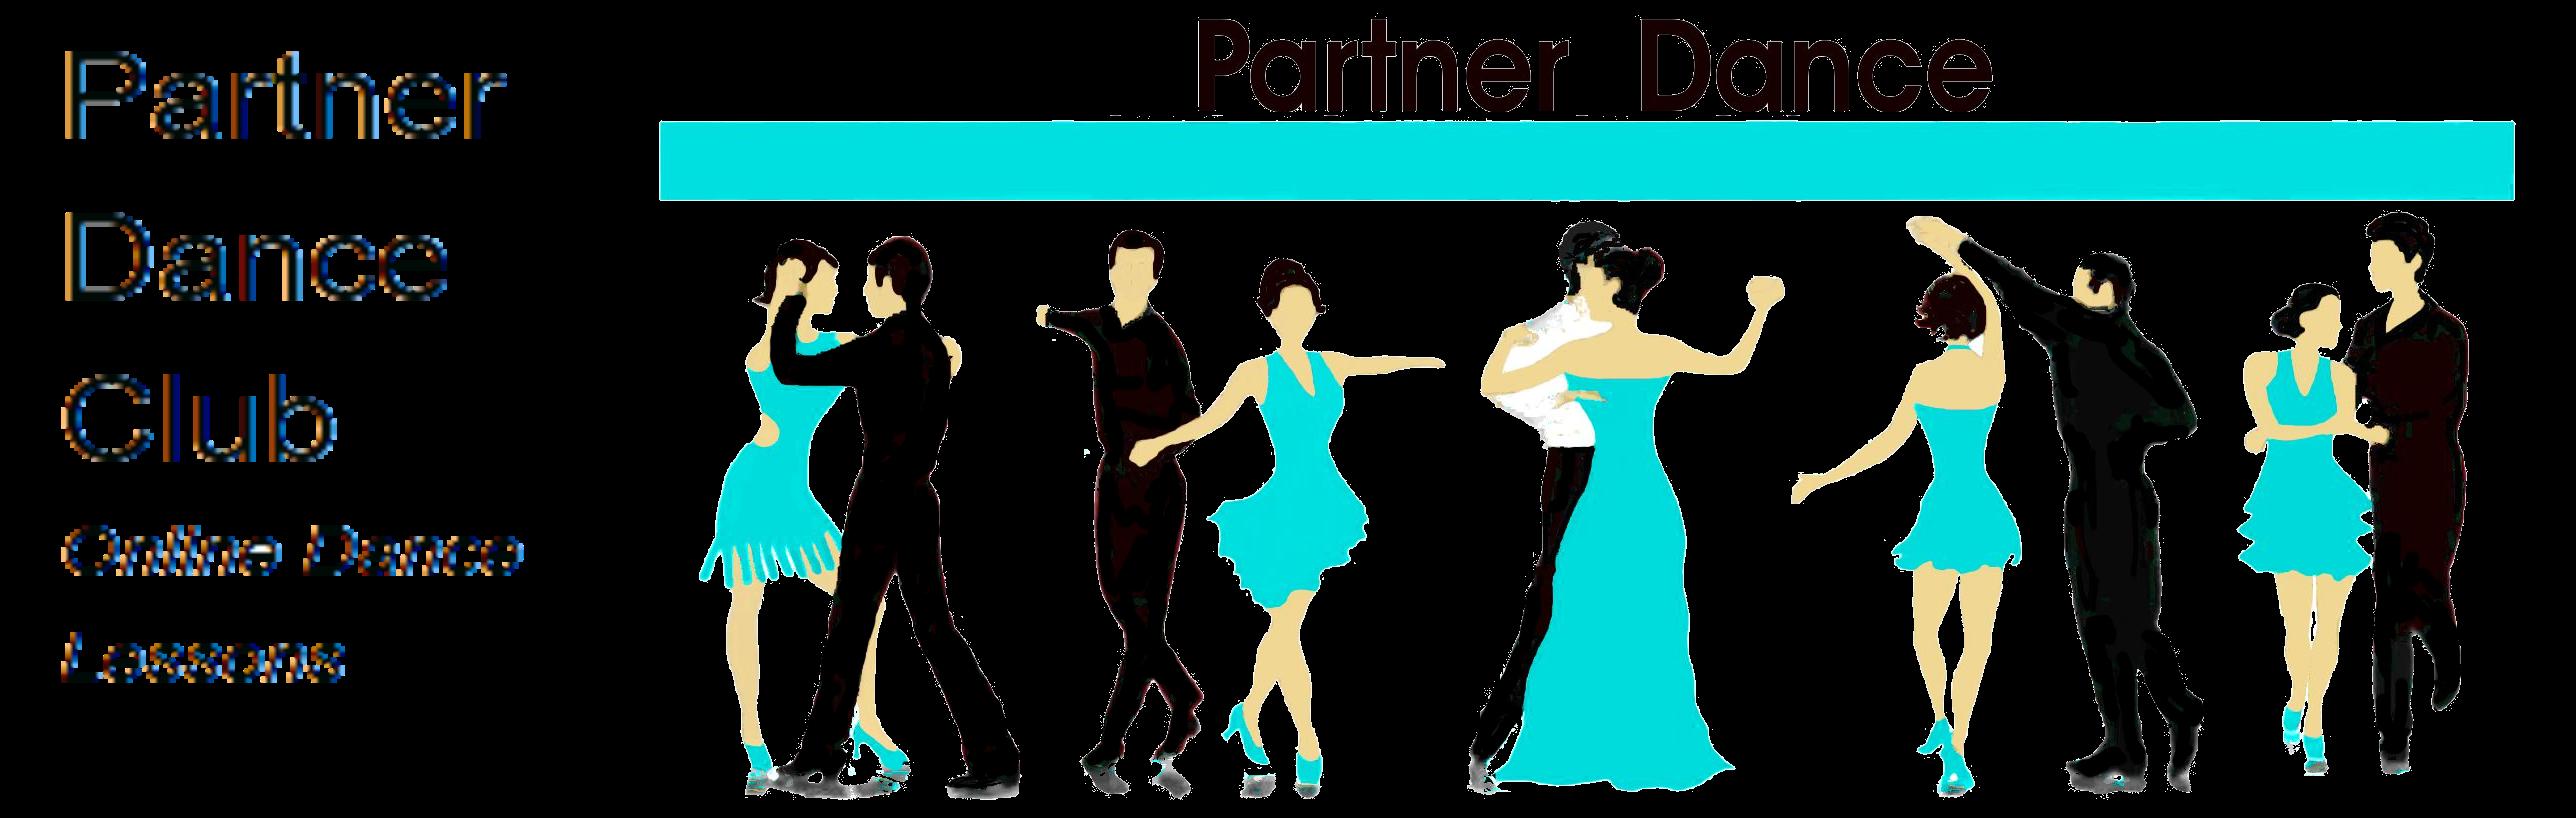 Partner Dance Club Online